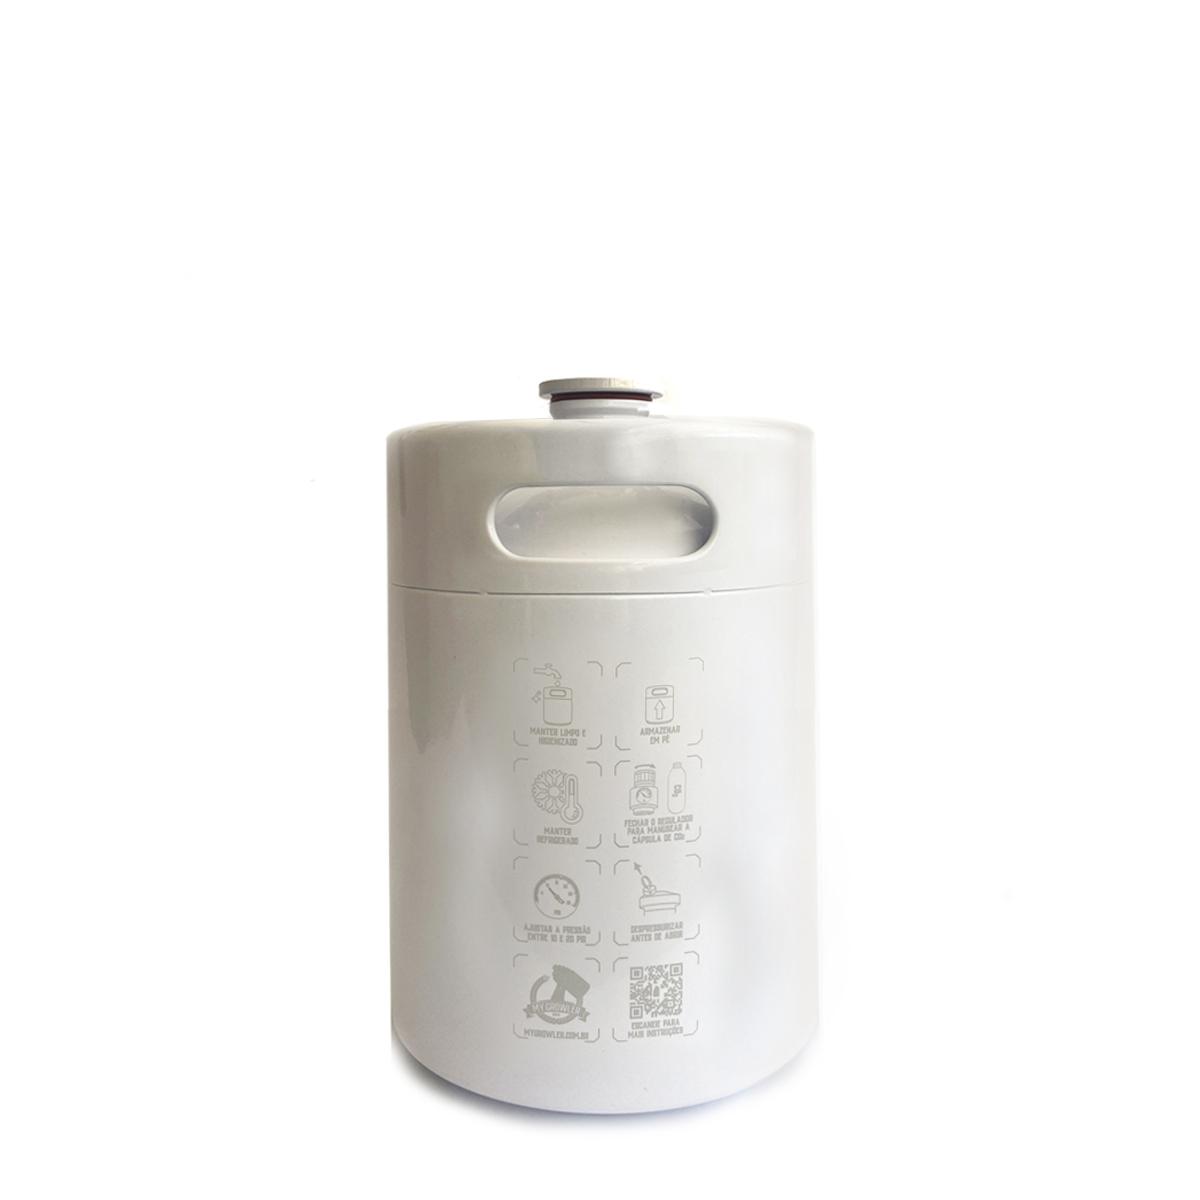 Kit My Keg: Chopeira 5L branco com torneira italiana premium